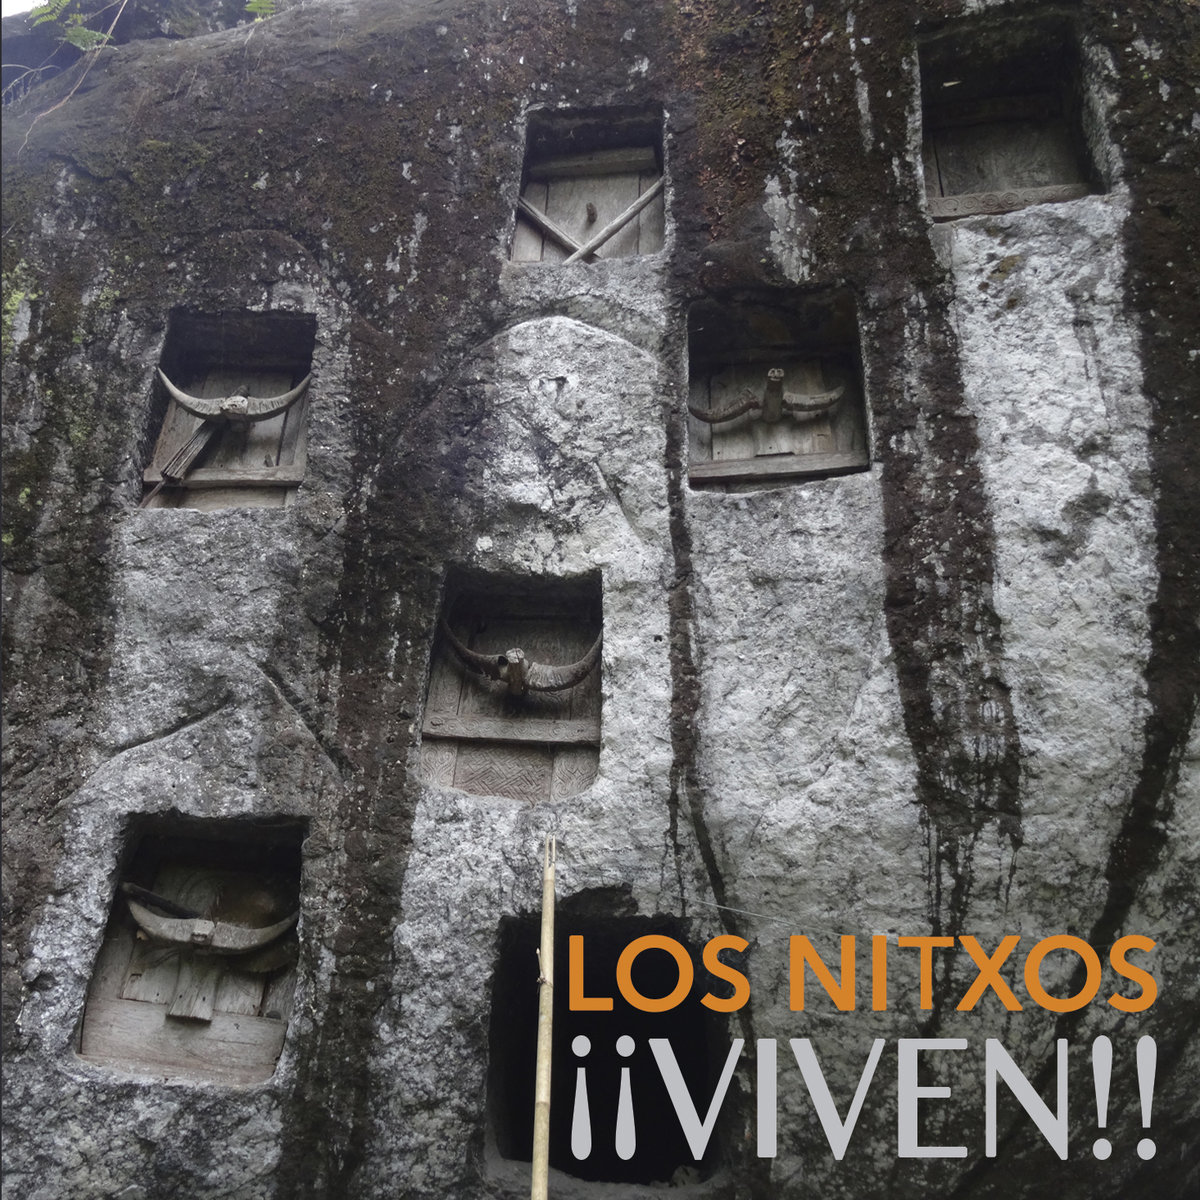 portada del album ¡¡Viven!!